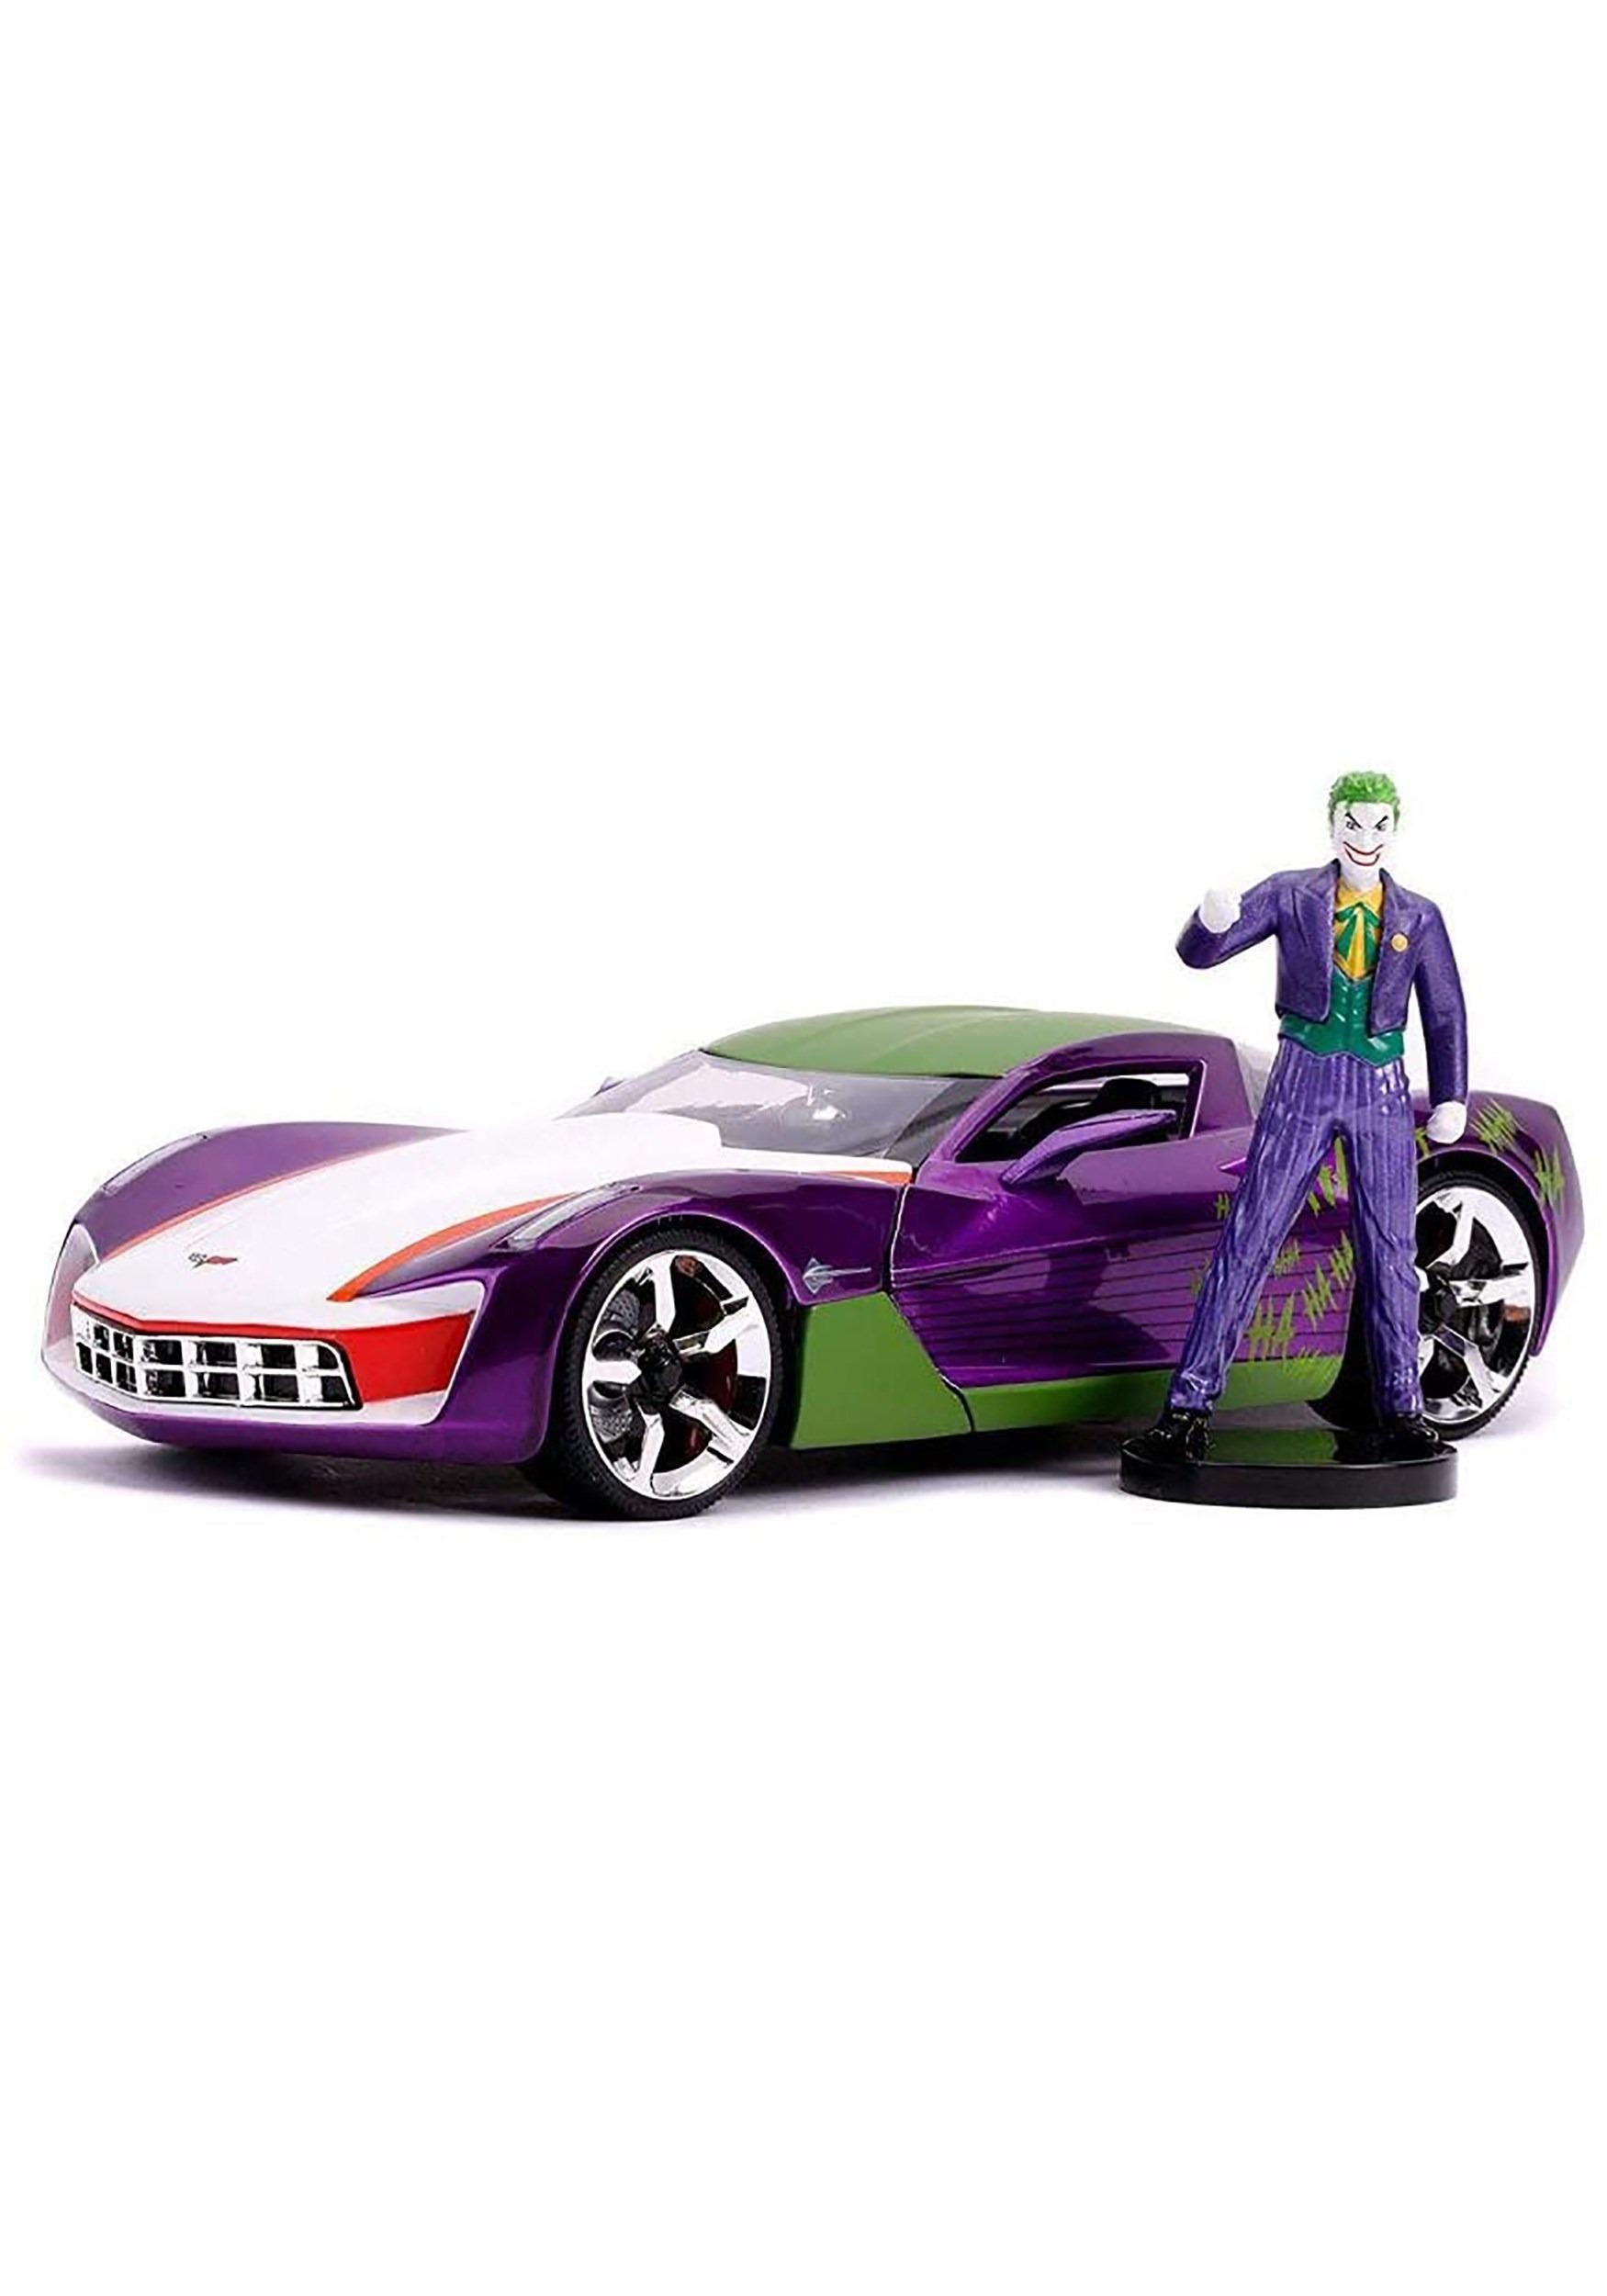 2009 Chevy Corvette Stingray w/ Joker 1:24 Scale Die Cast Car